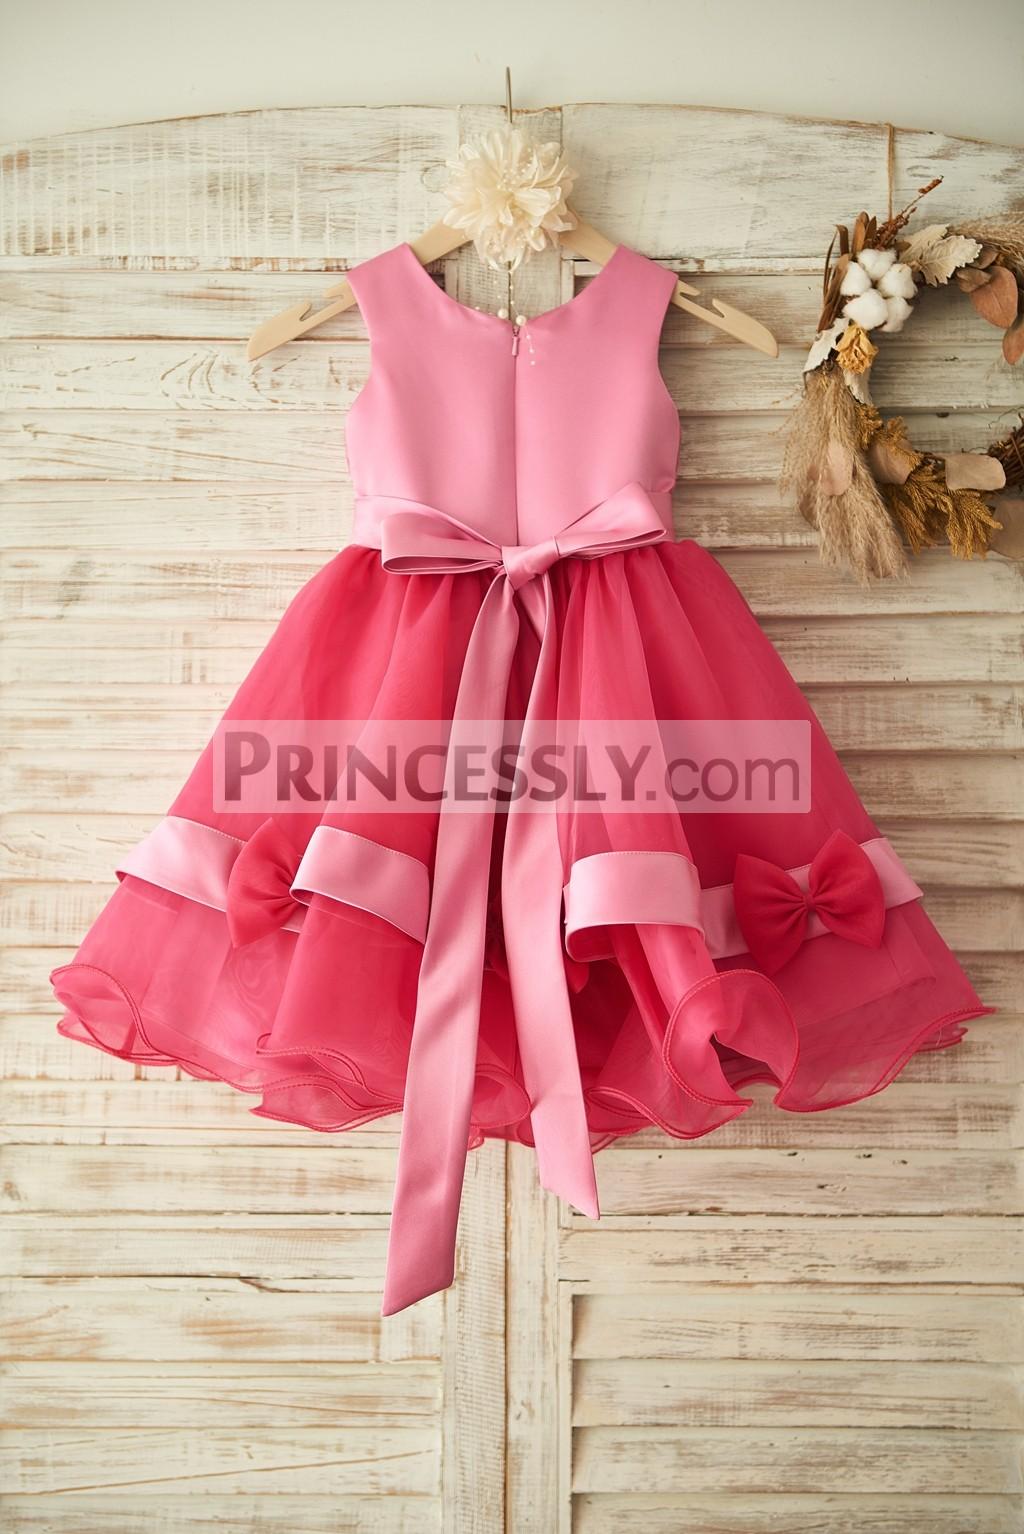 Fuschia Lace Organza Princess Flower Girl Dress With Belt